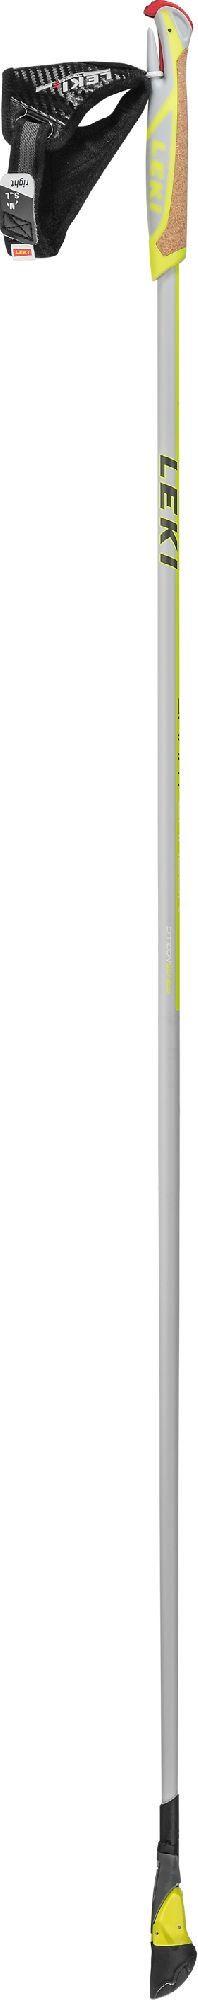 LEKI Kije Nordic Walking Smart Carbon 115 cm (6402